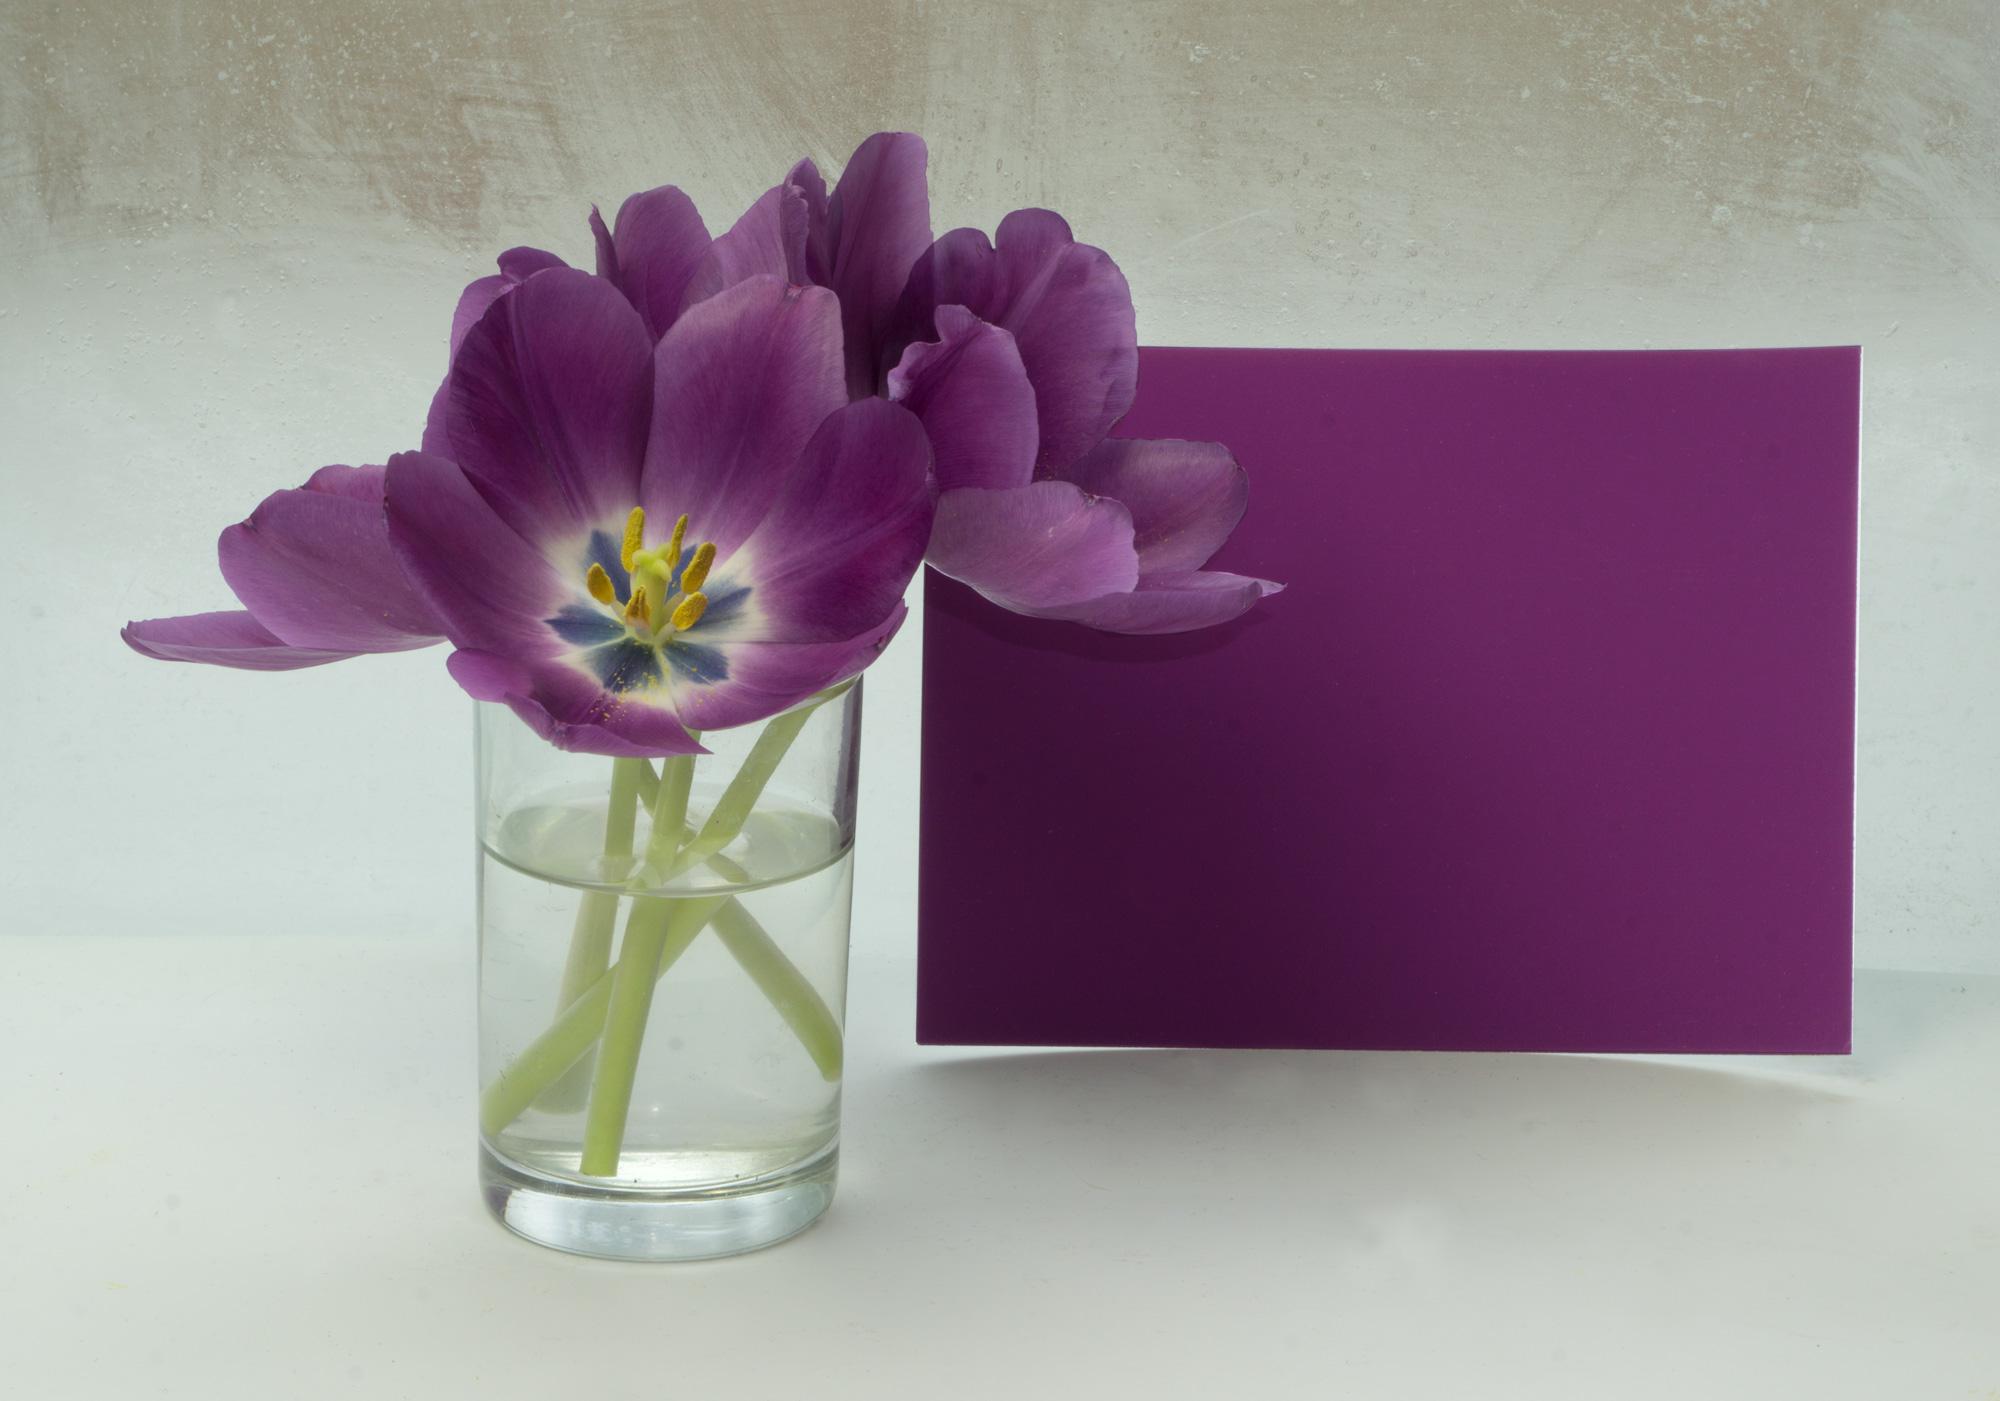 Flower : Tulip 2a, 2017